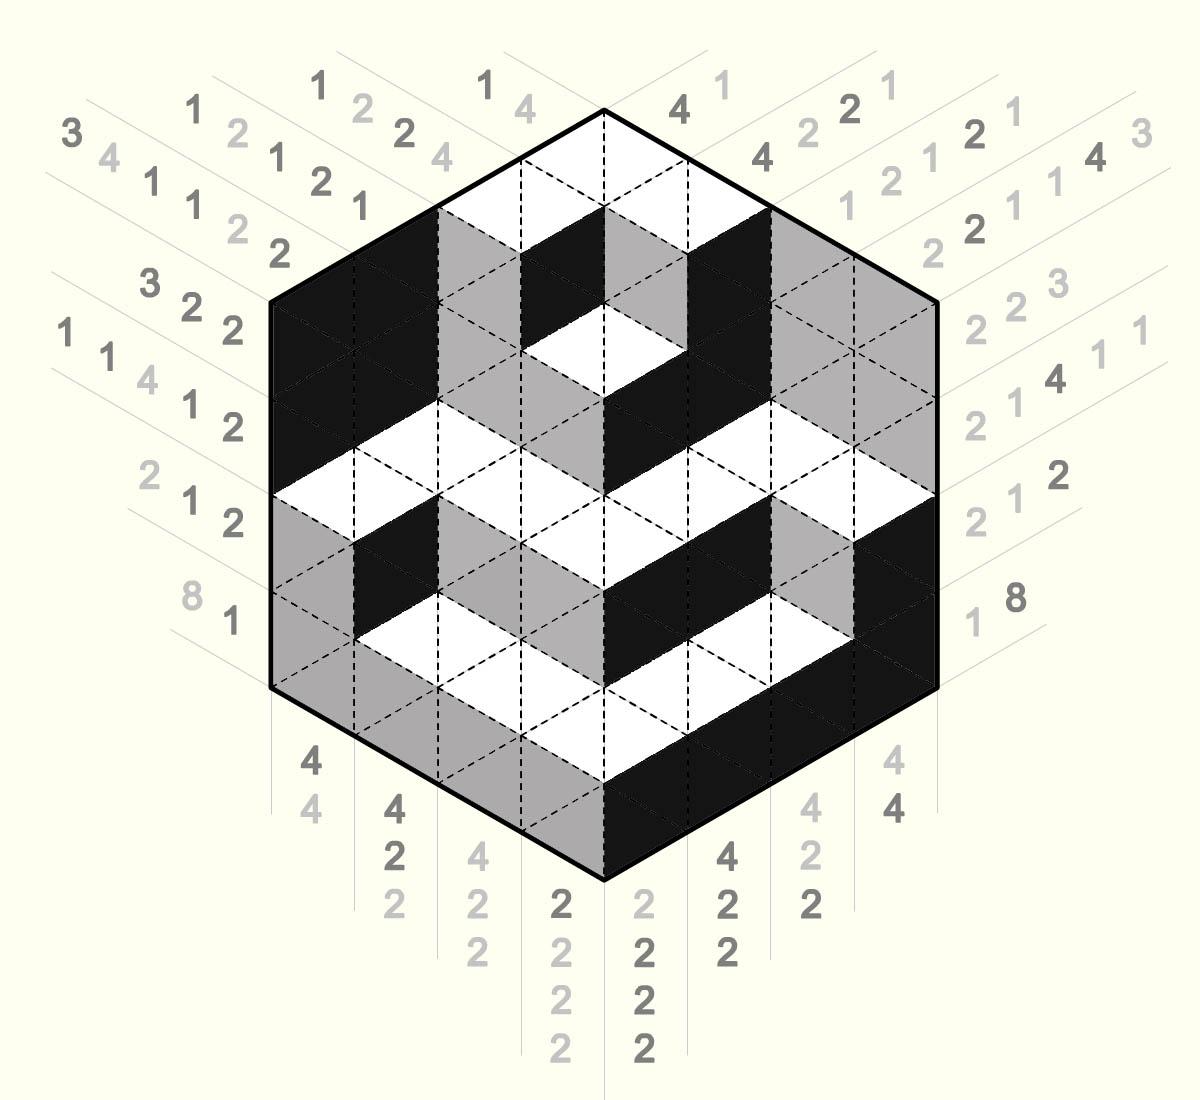 http://www.prise2tete.fr/upload/sosoy-cubes.jpg